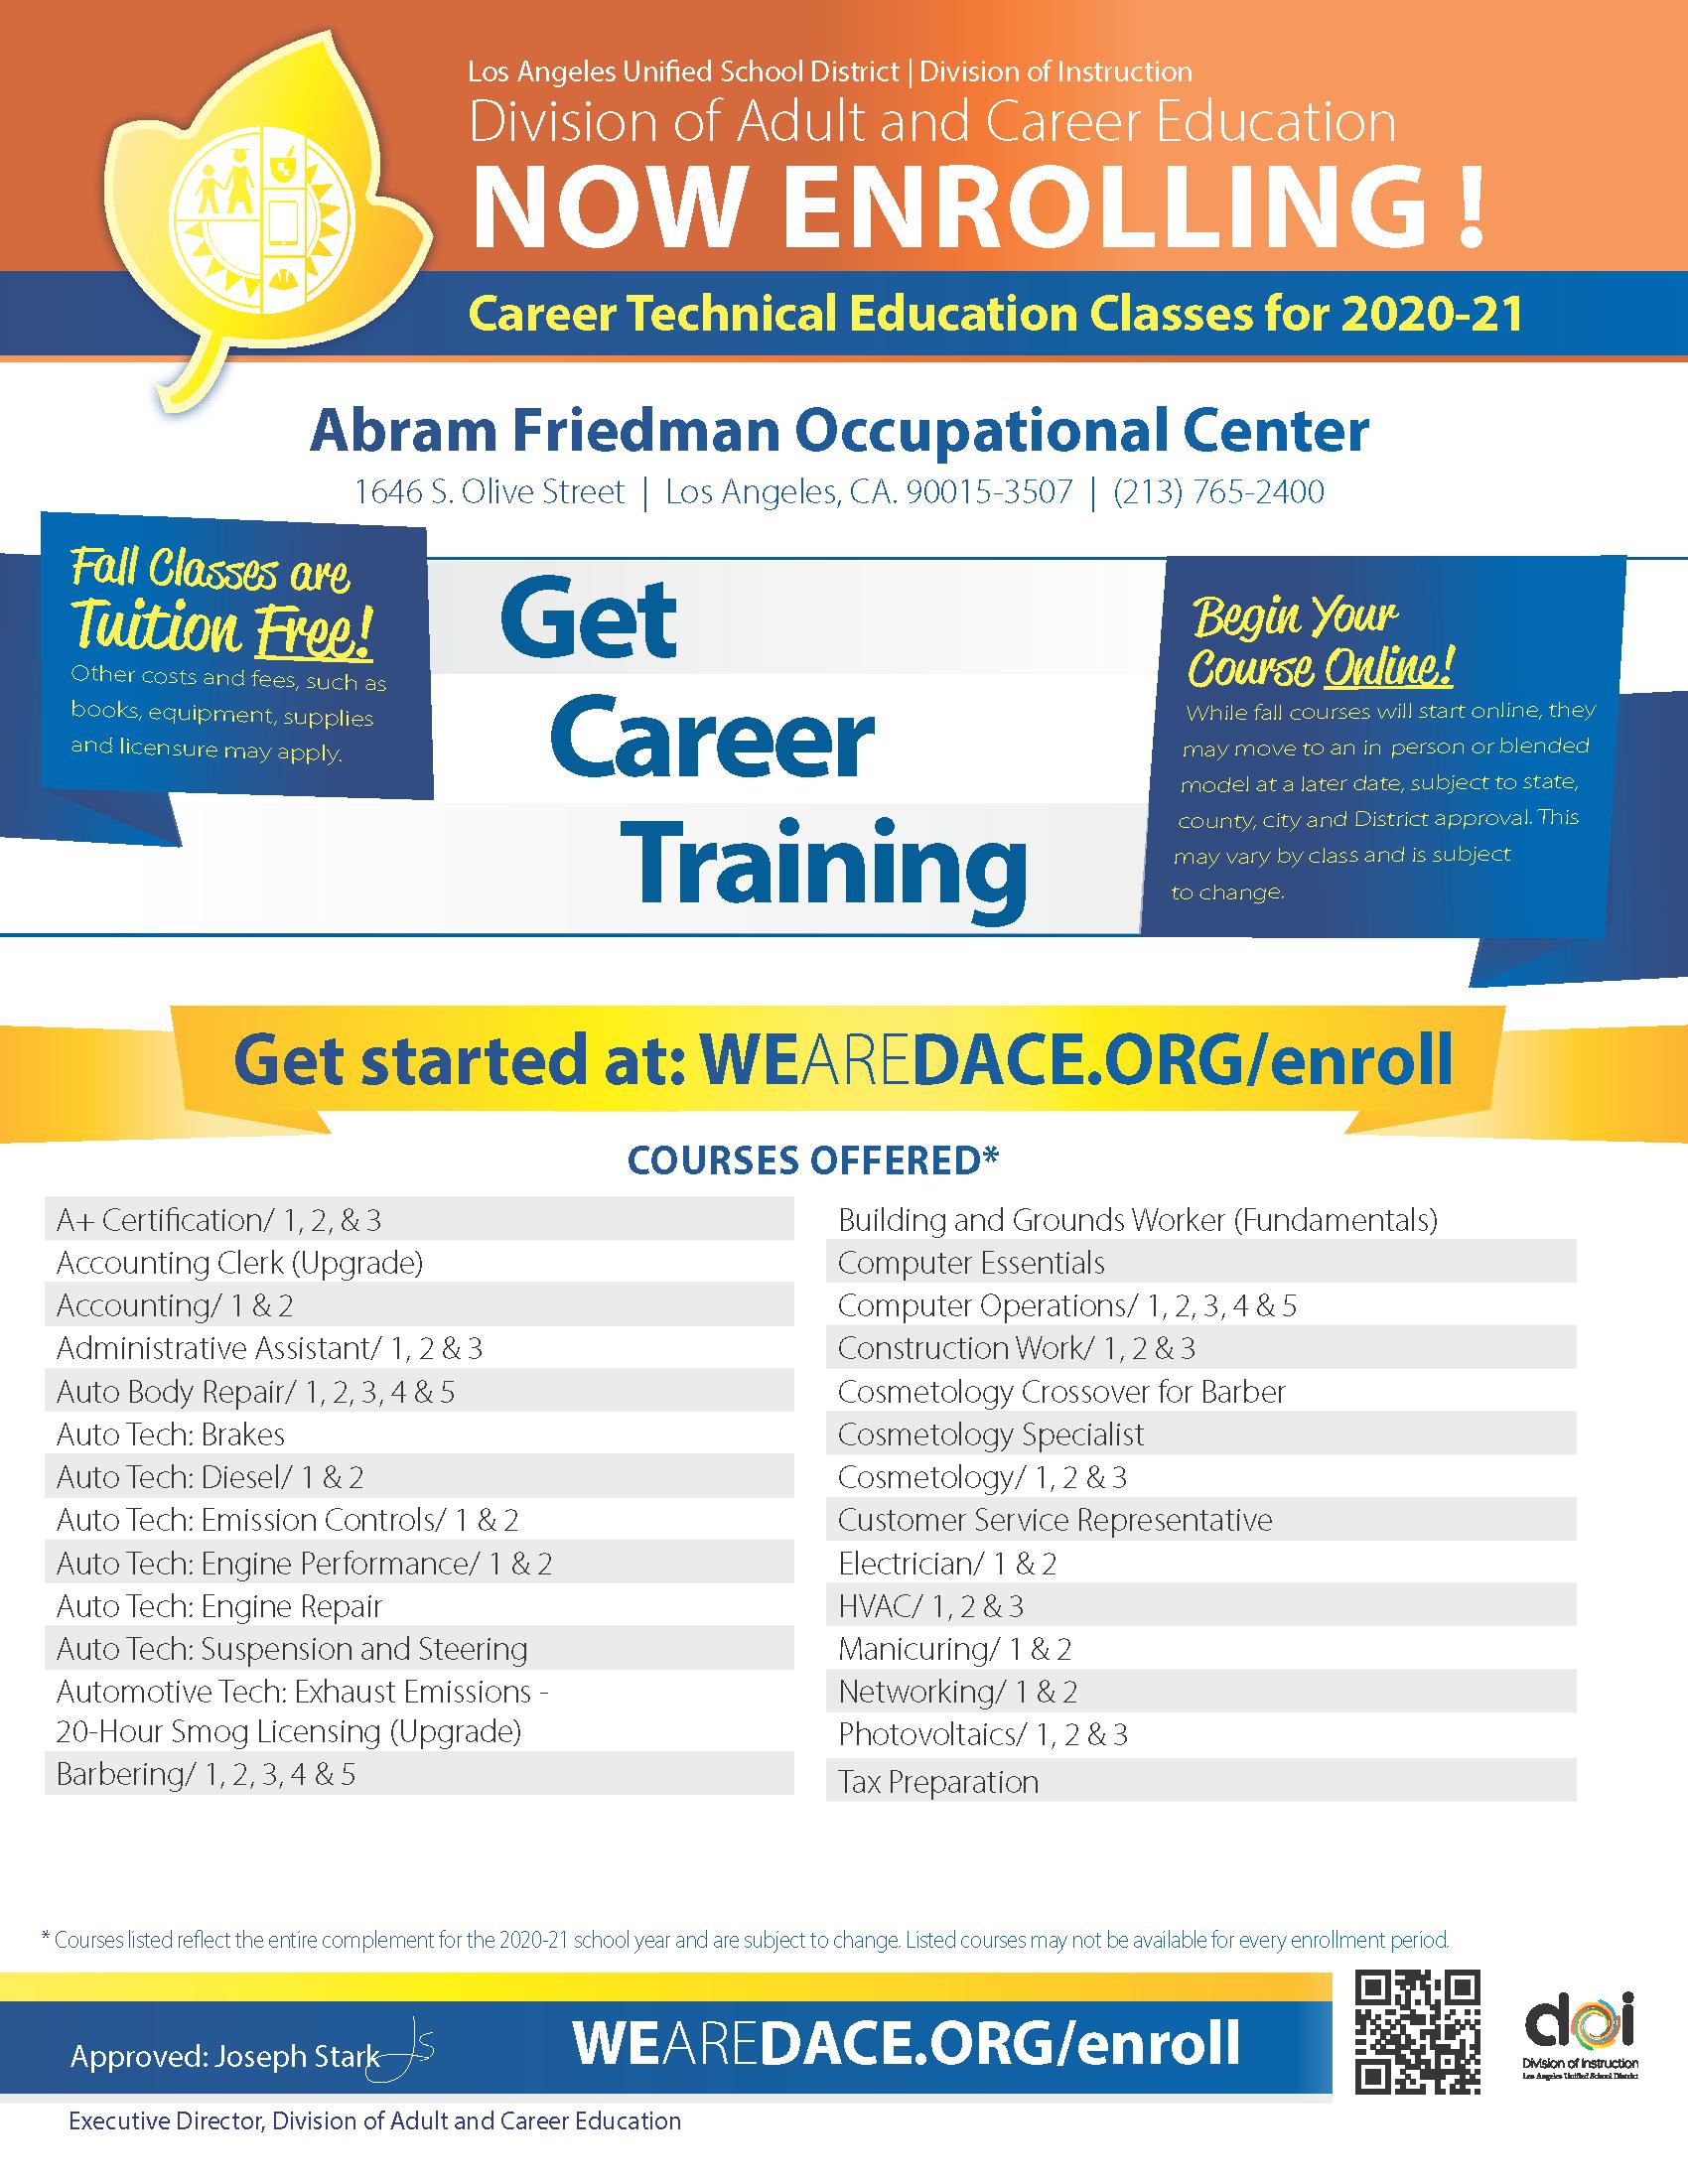 Career Technical Education Flyer for 2020-21